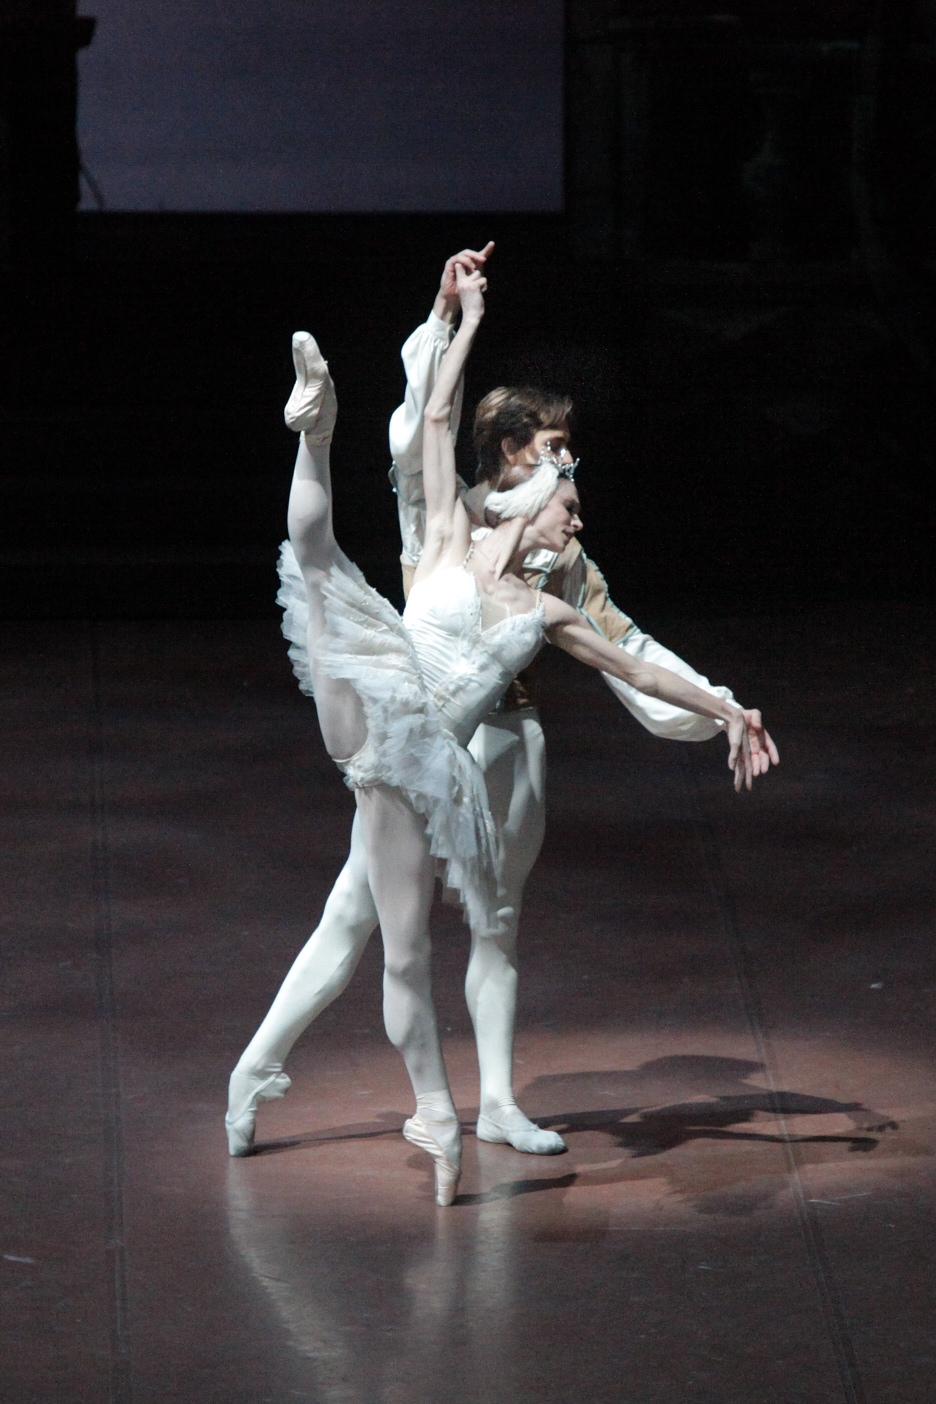 Polina Semionova with Friedemann Vogel in Swanlake ©Stuttgart Ballet